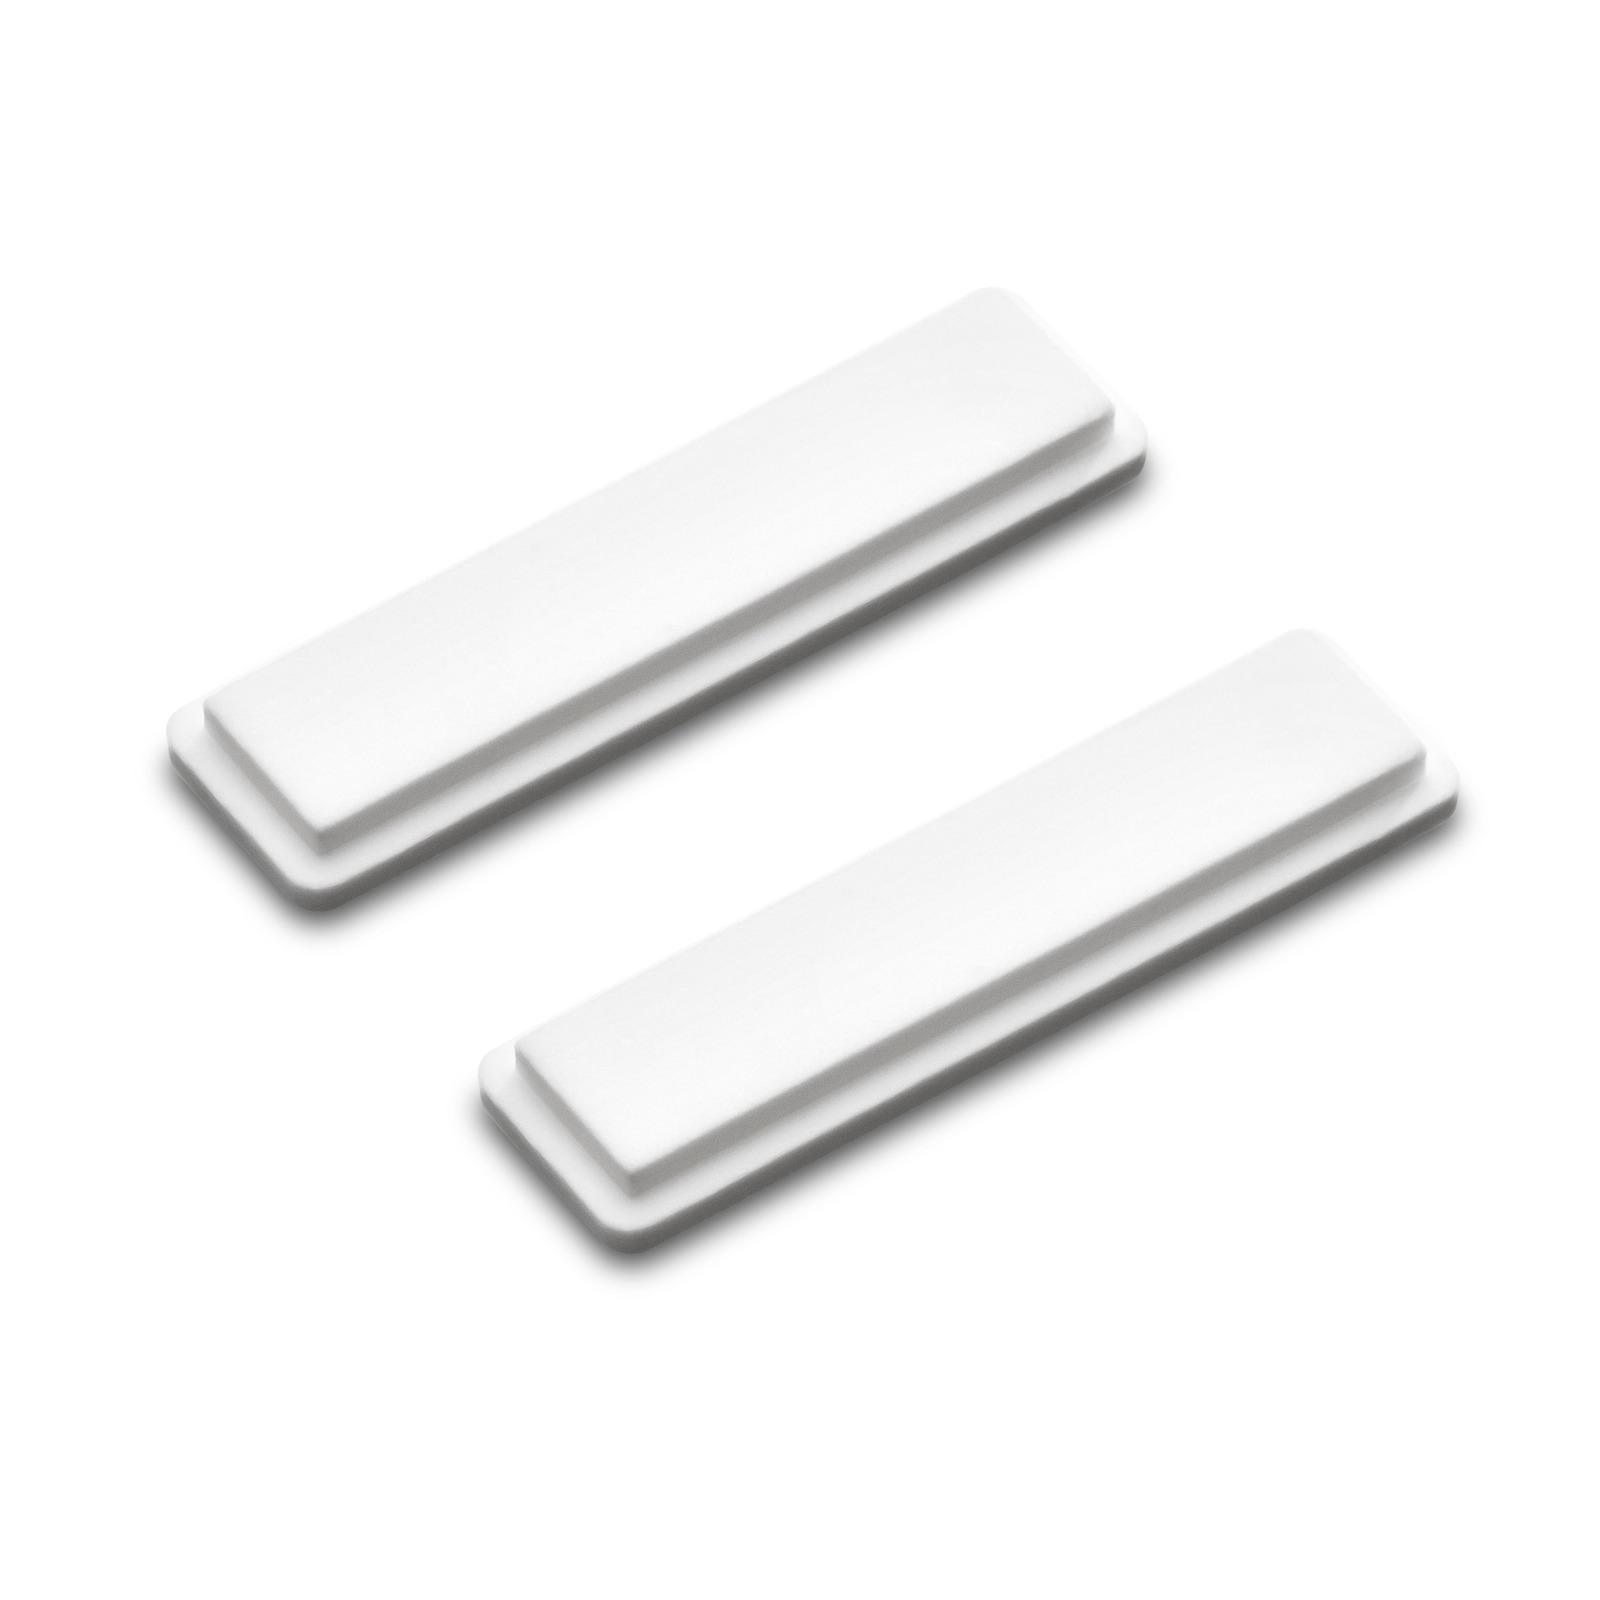 Image of Ersatz - Sensor Pad